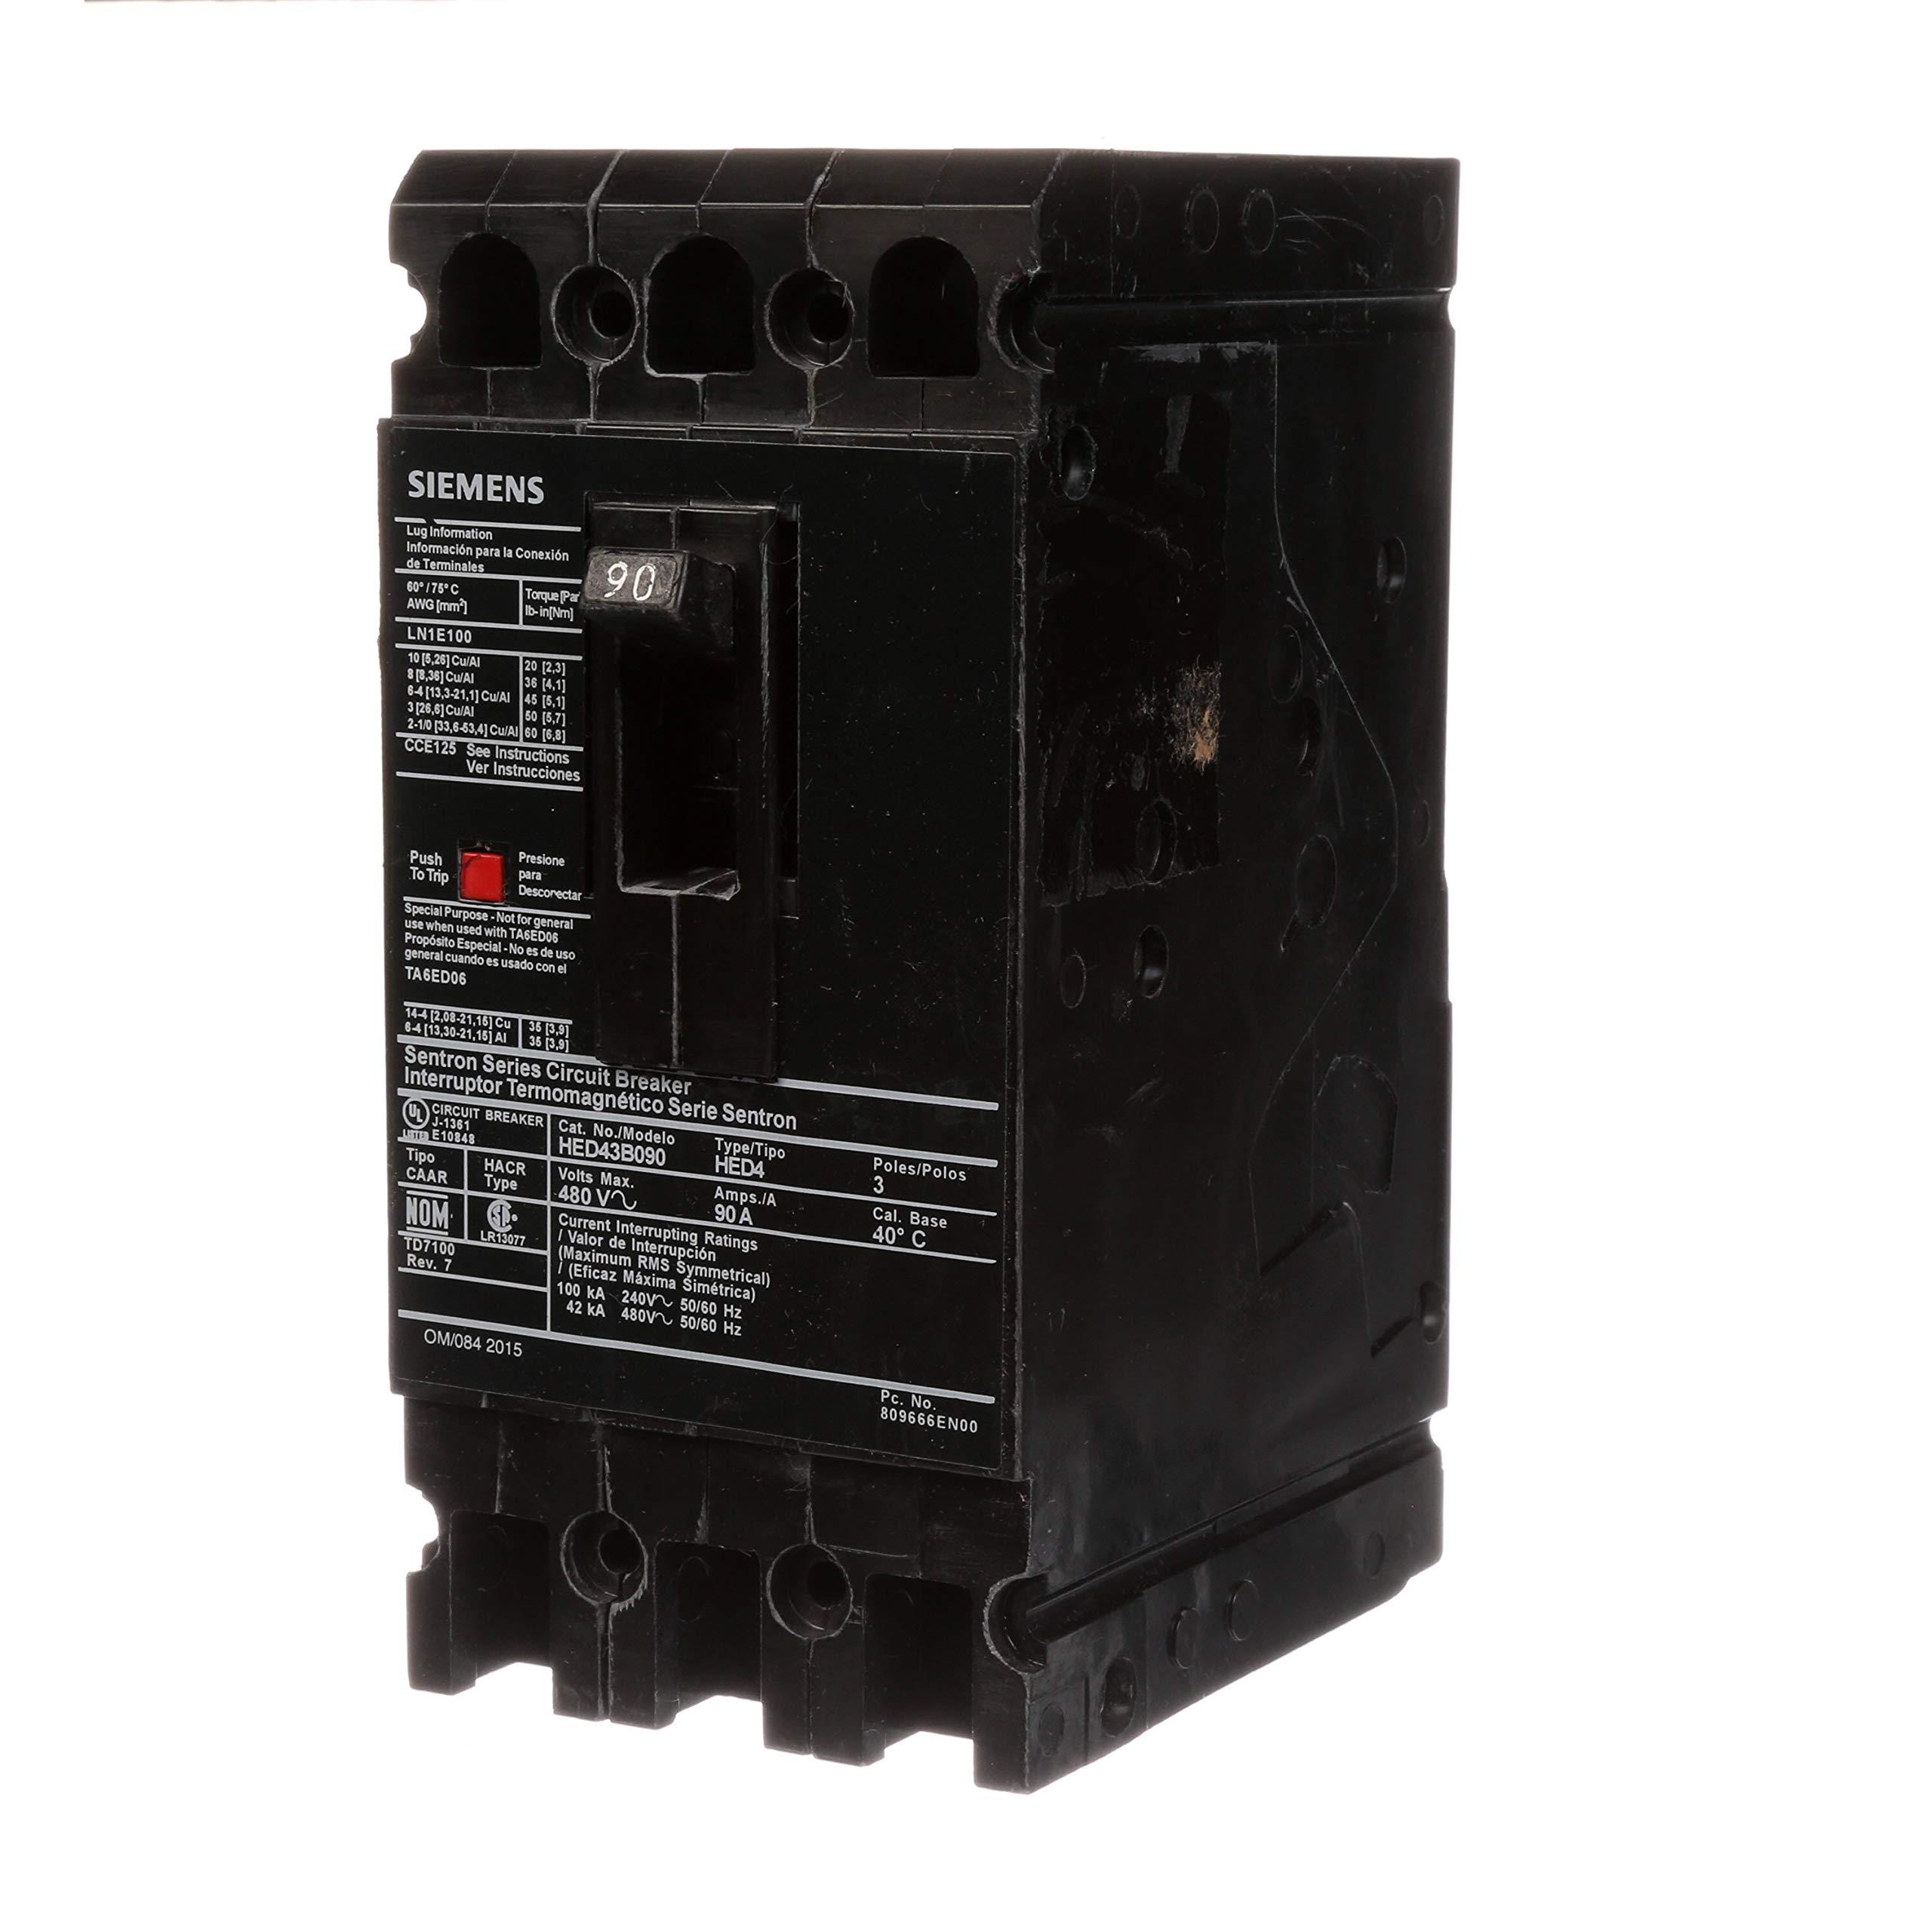 Siemens HED43B090 Circuit Breaker, Type HED4, 90 Amp, 3 Pole